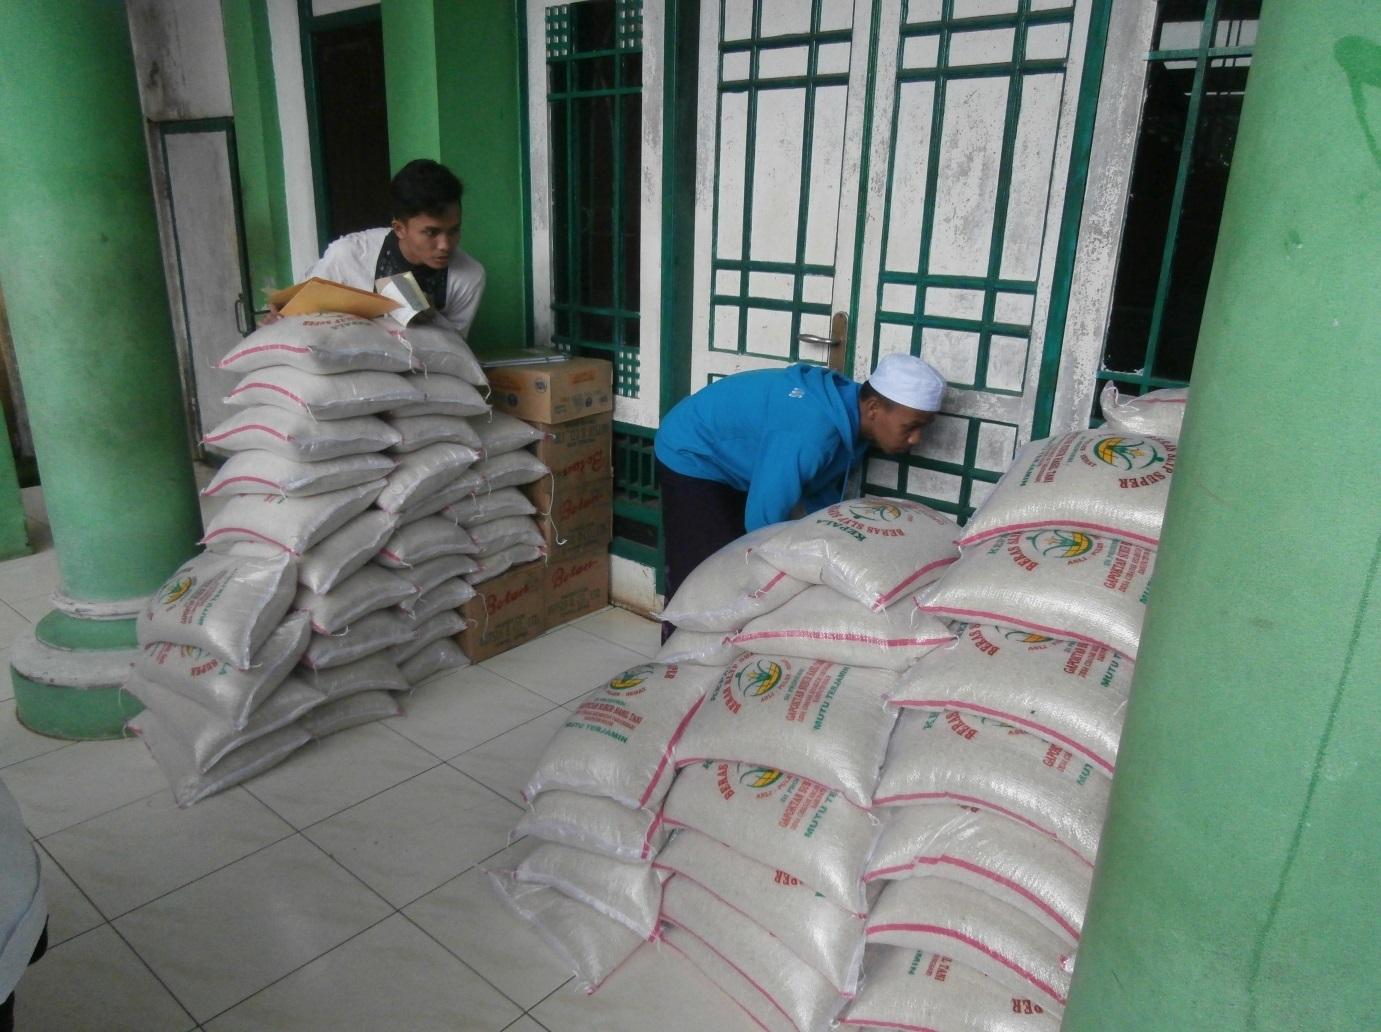 Paket bantuan di Yayasan As-Shriyyah Nurul Iman, Kecamatan Parung